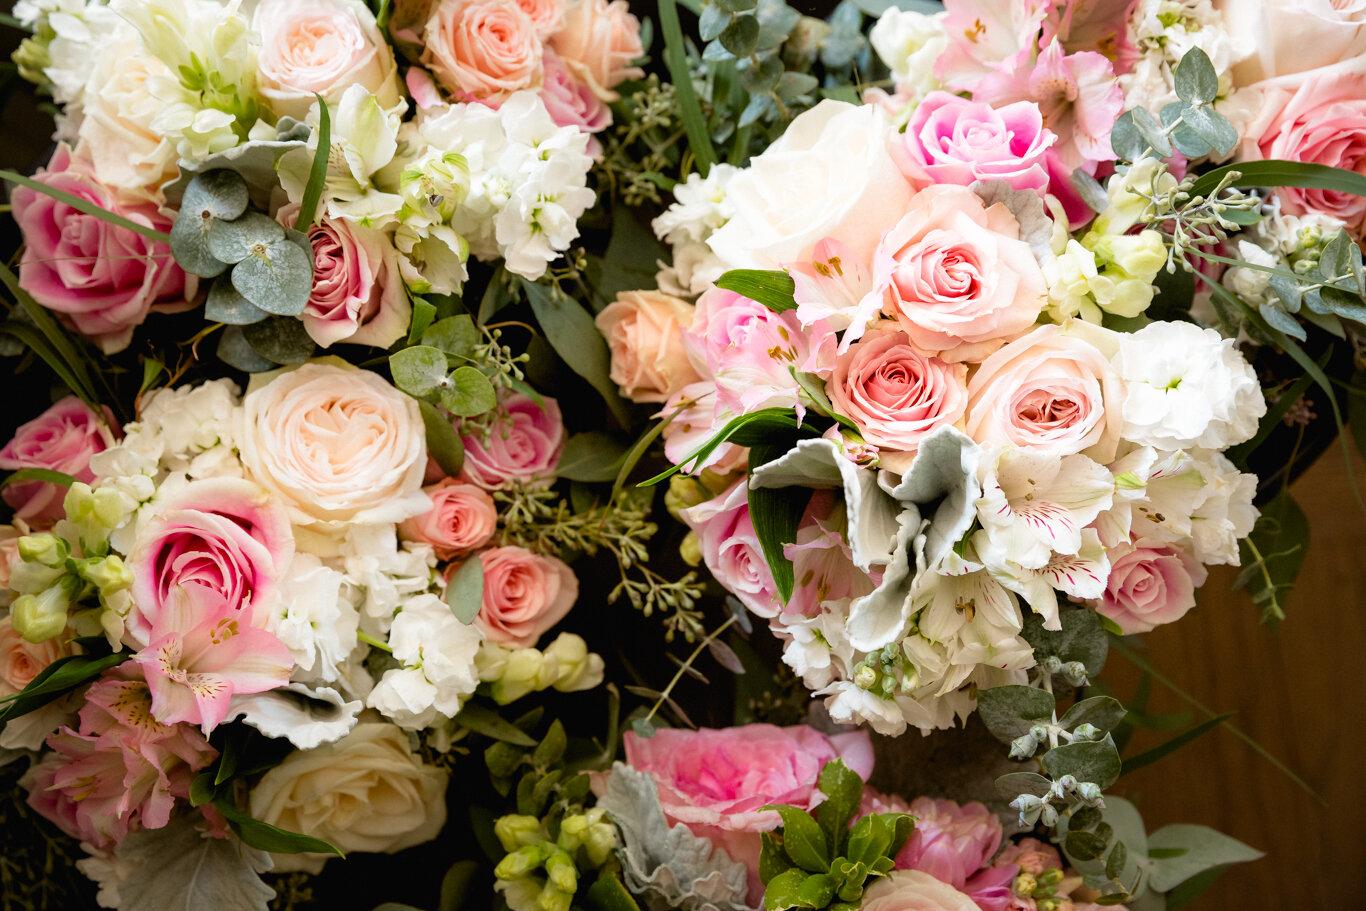 2019.08.24_Emily-Ashir-Wedding-at-the-Maples-4920.jpg